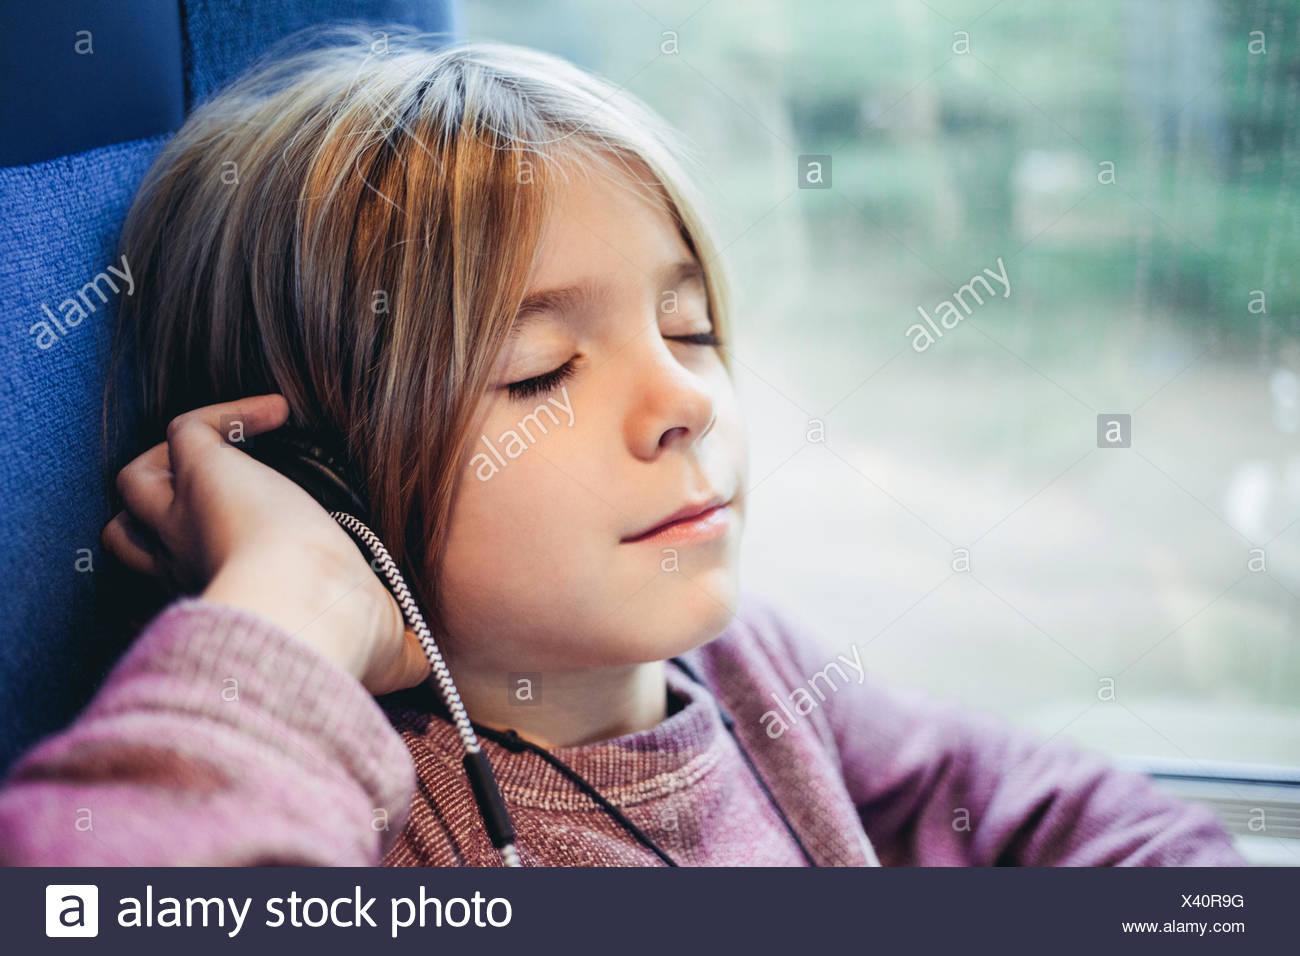 Boy listening to music Photo Stock